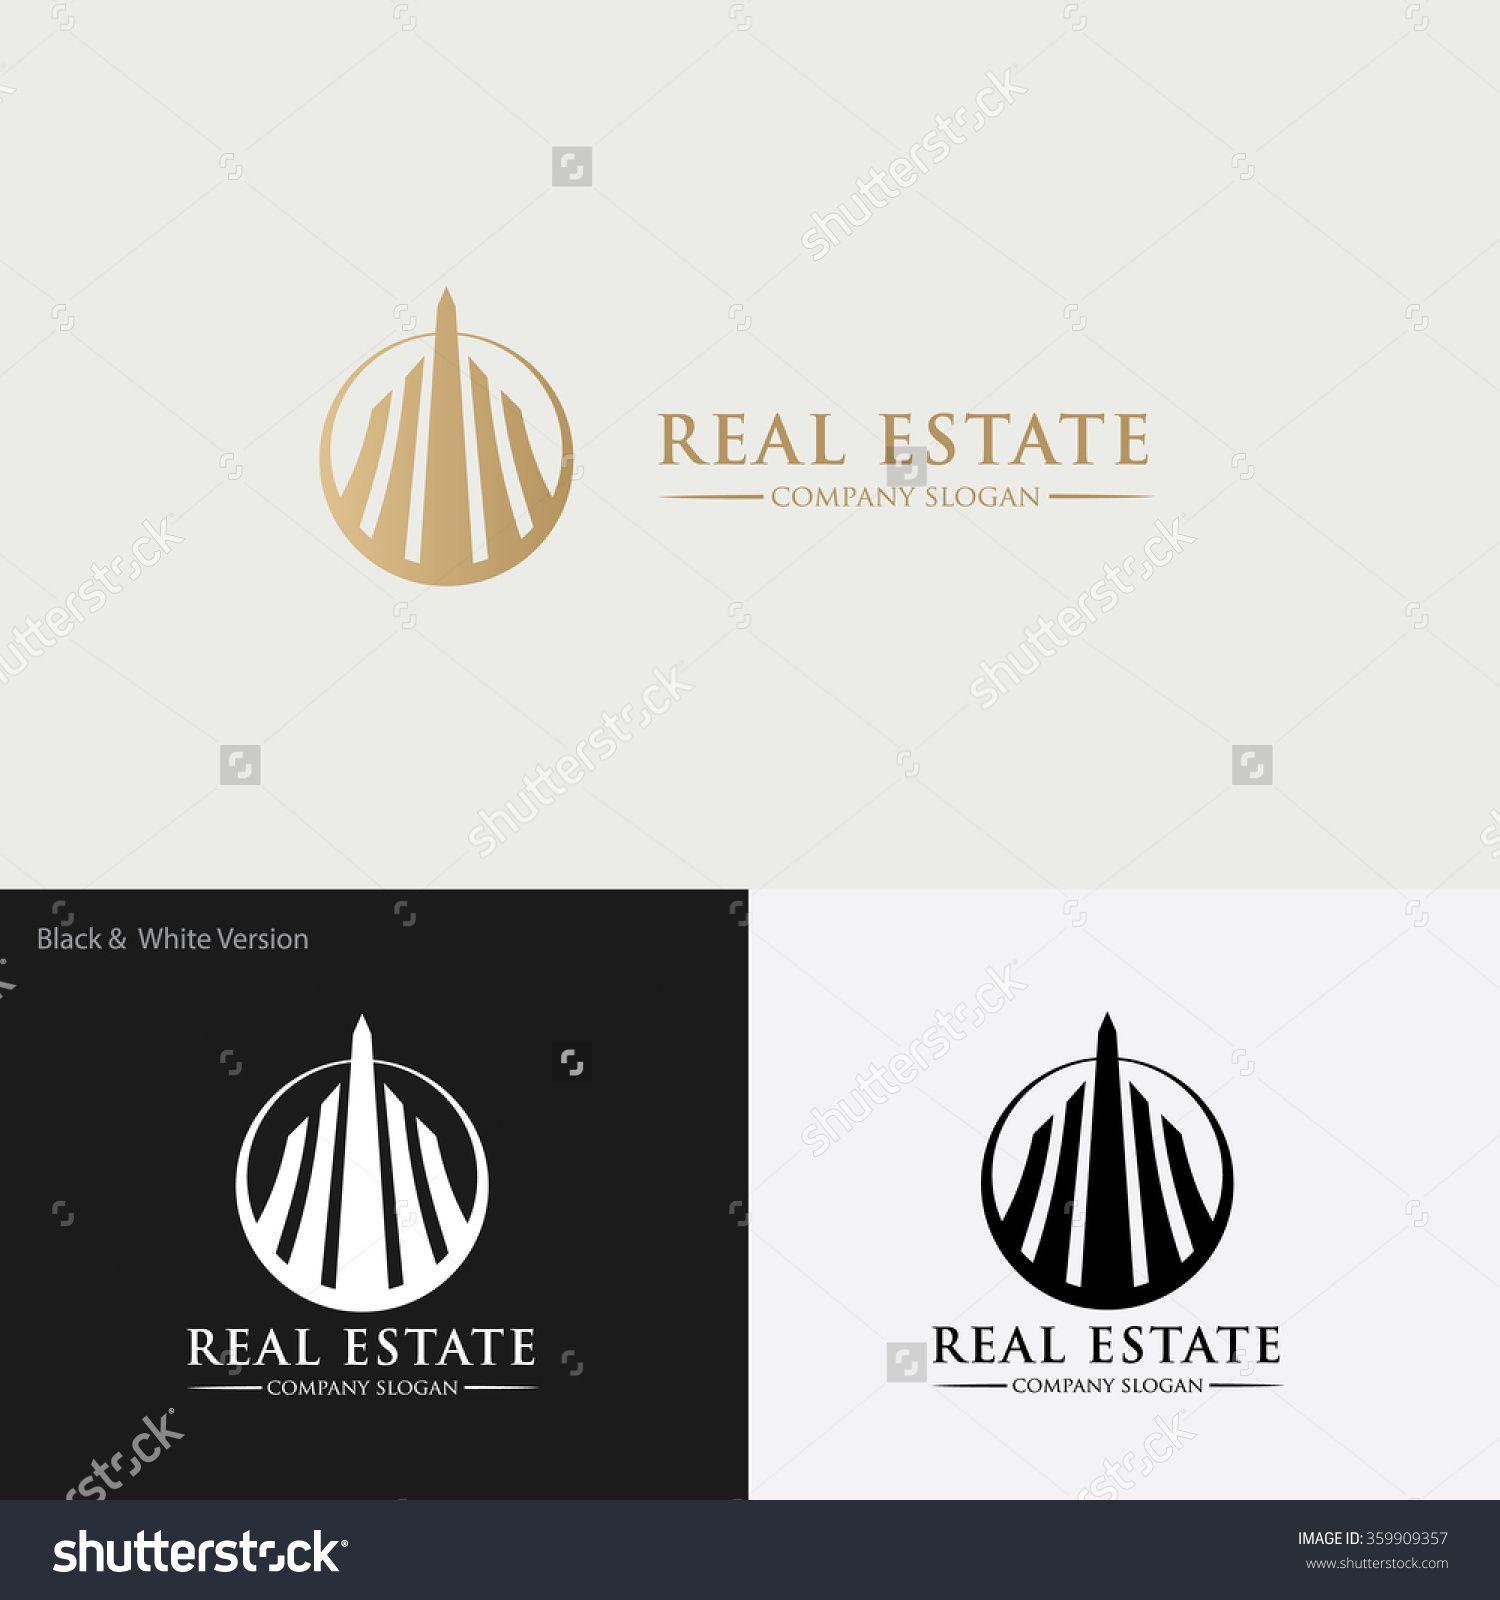 Real Estate Logo,Hotel Logo,Building Logo,Property Logo